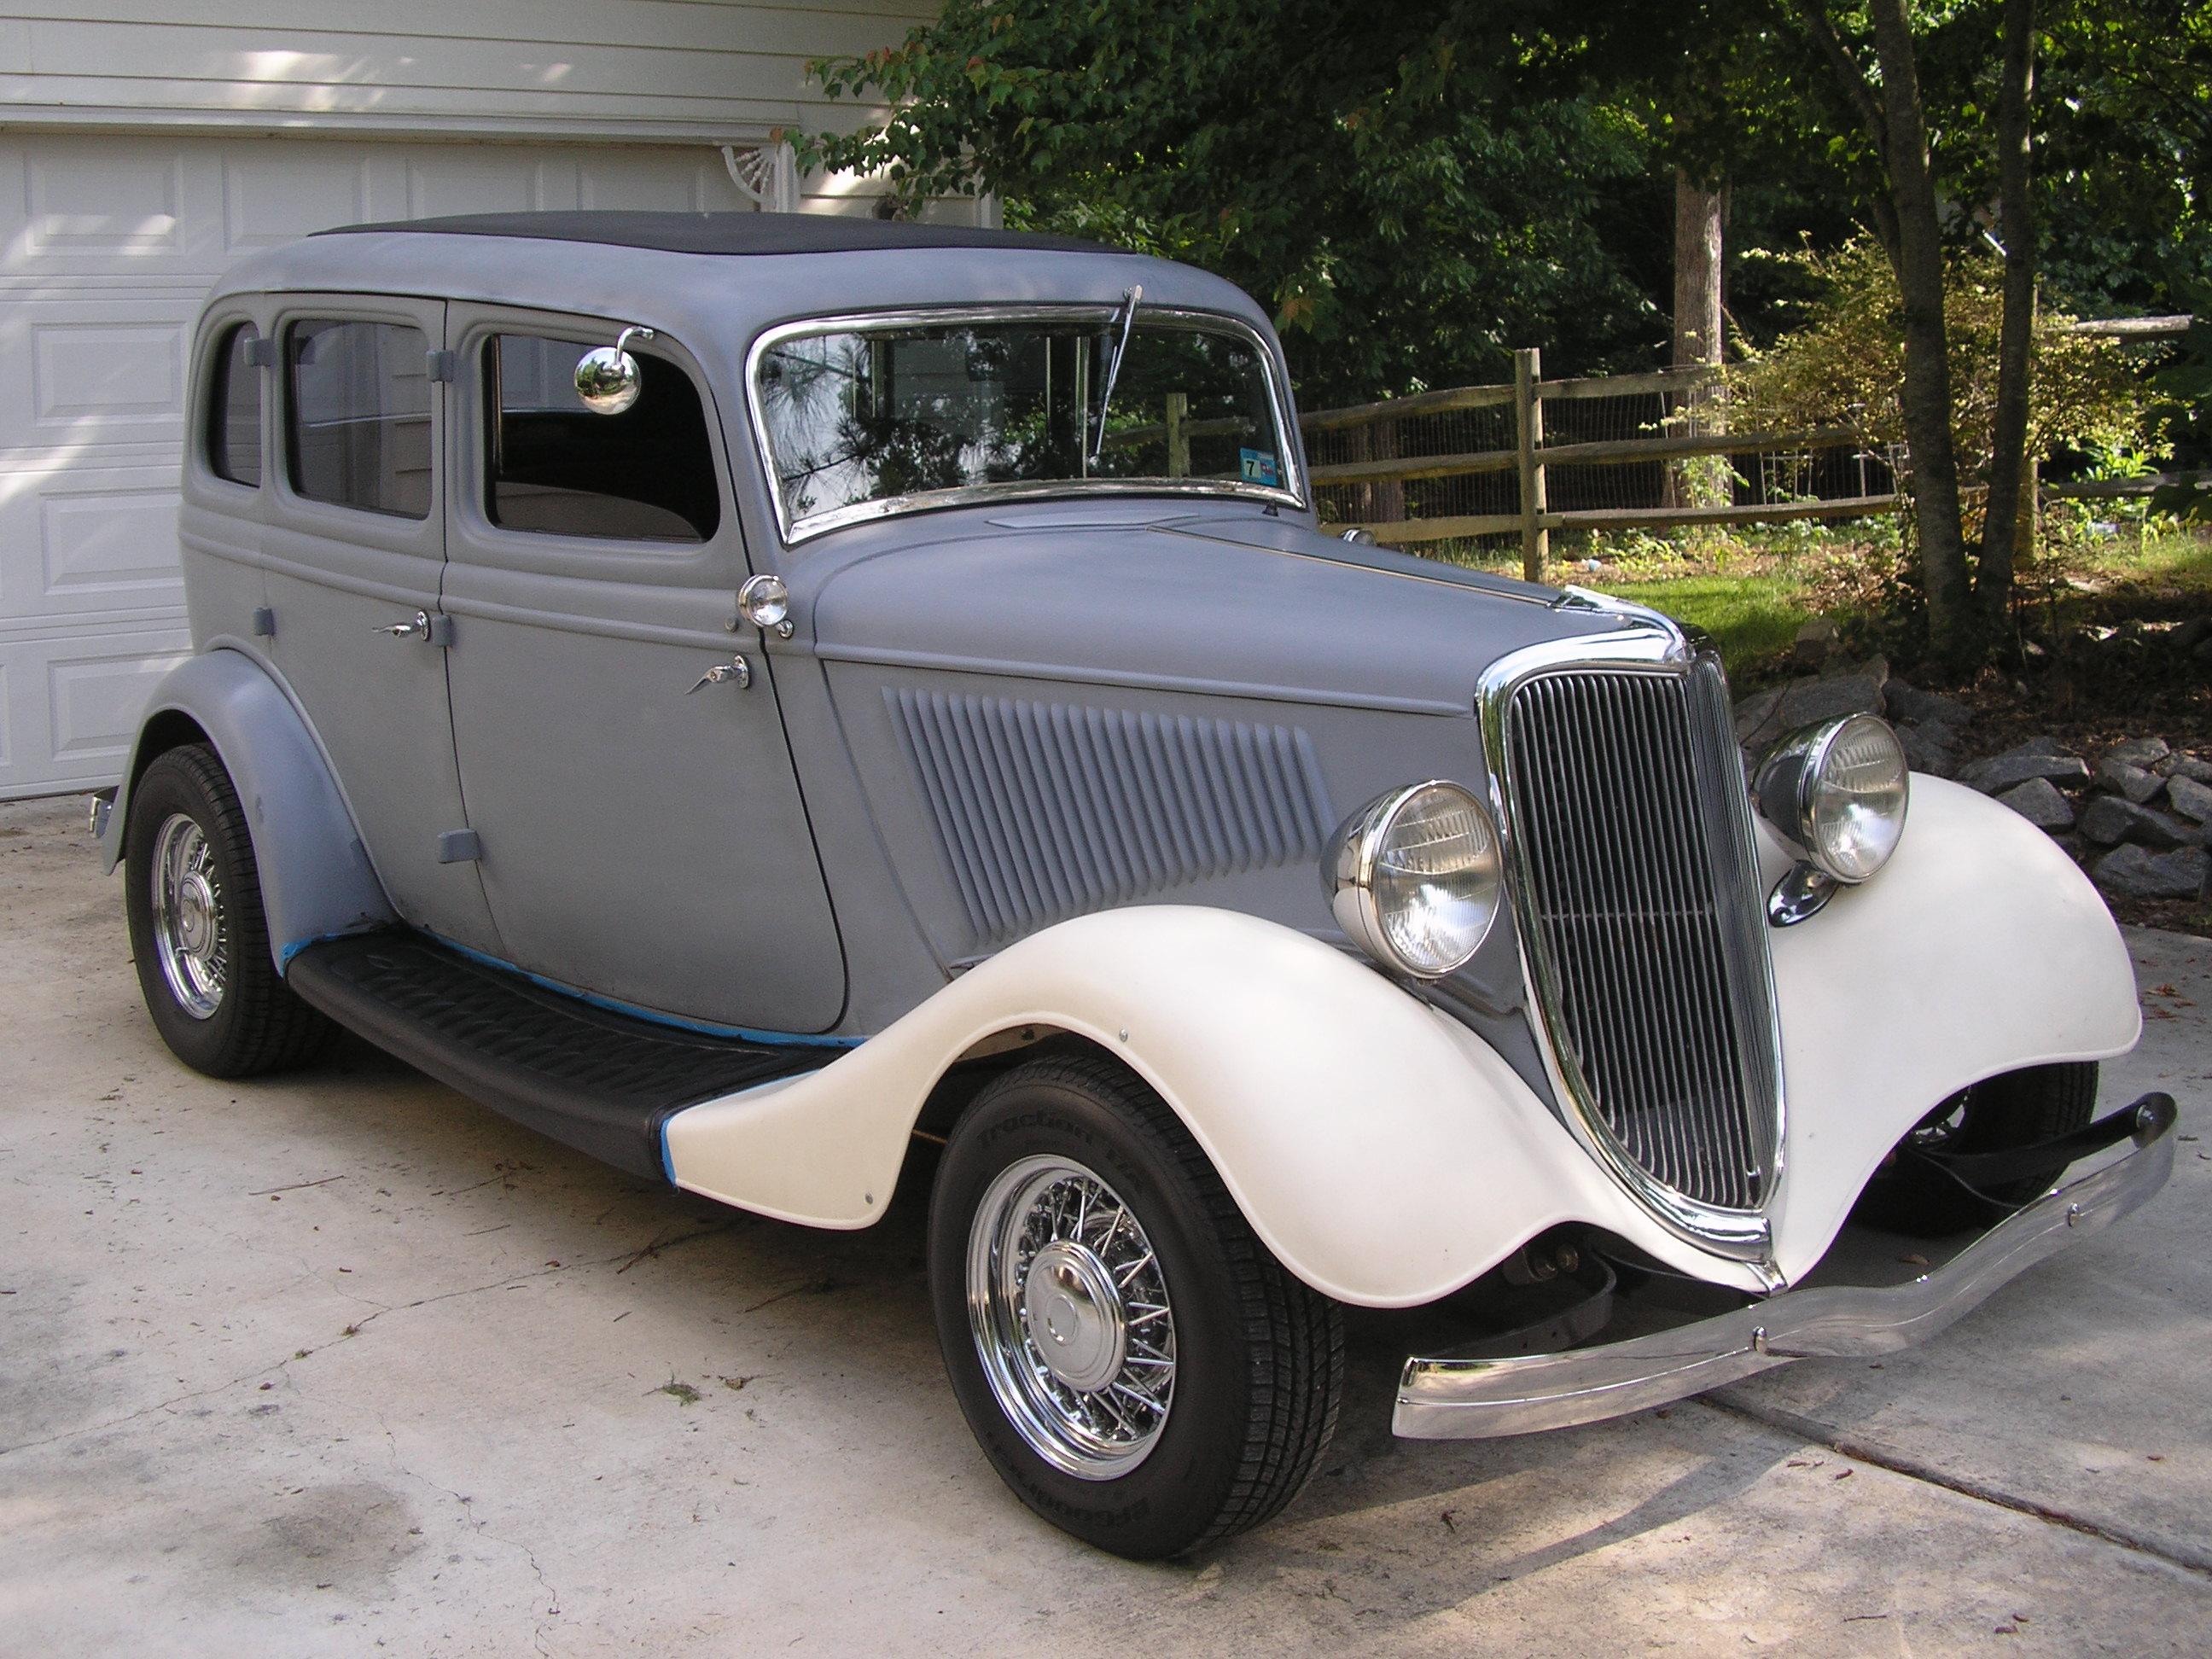 An Original All Steel 34 Ford Fordor Hotrod Hotline